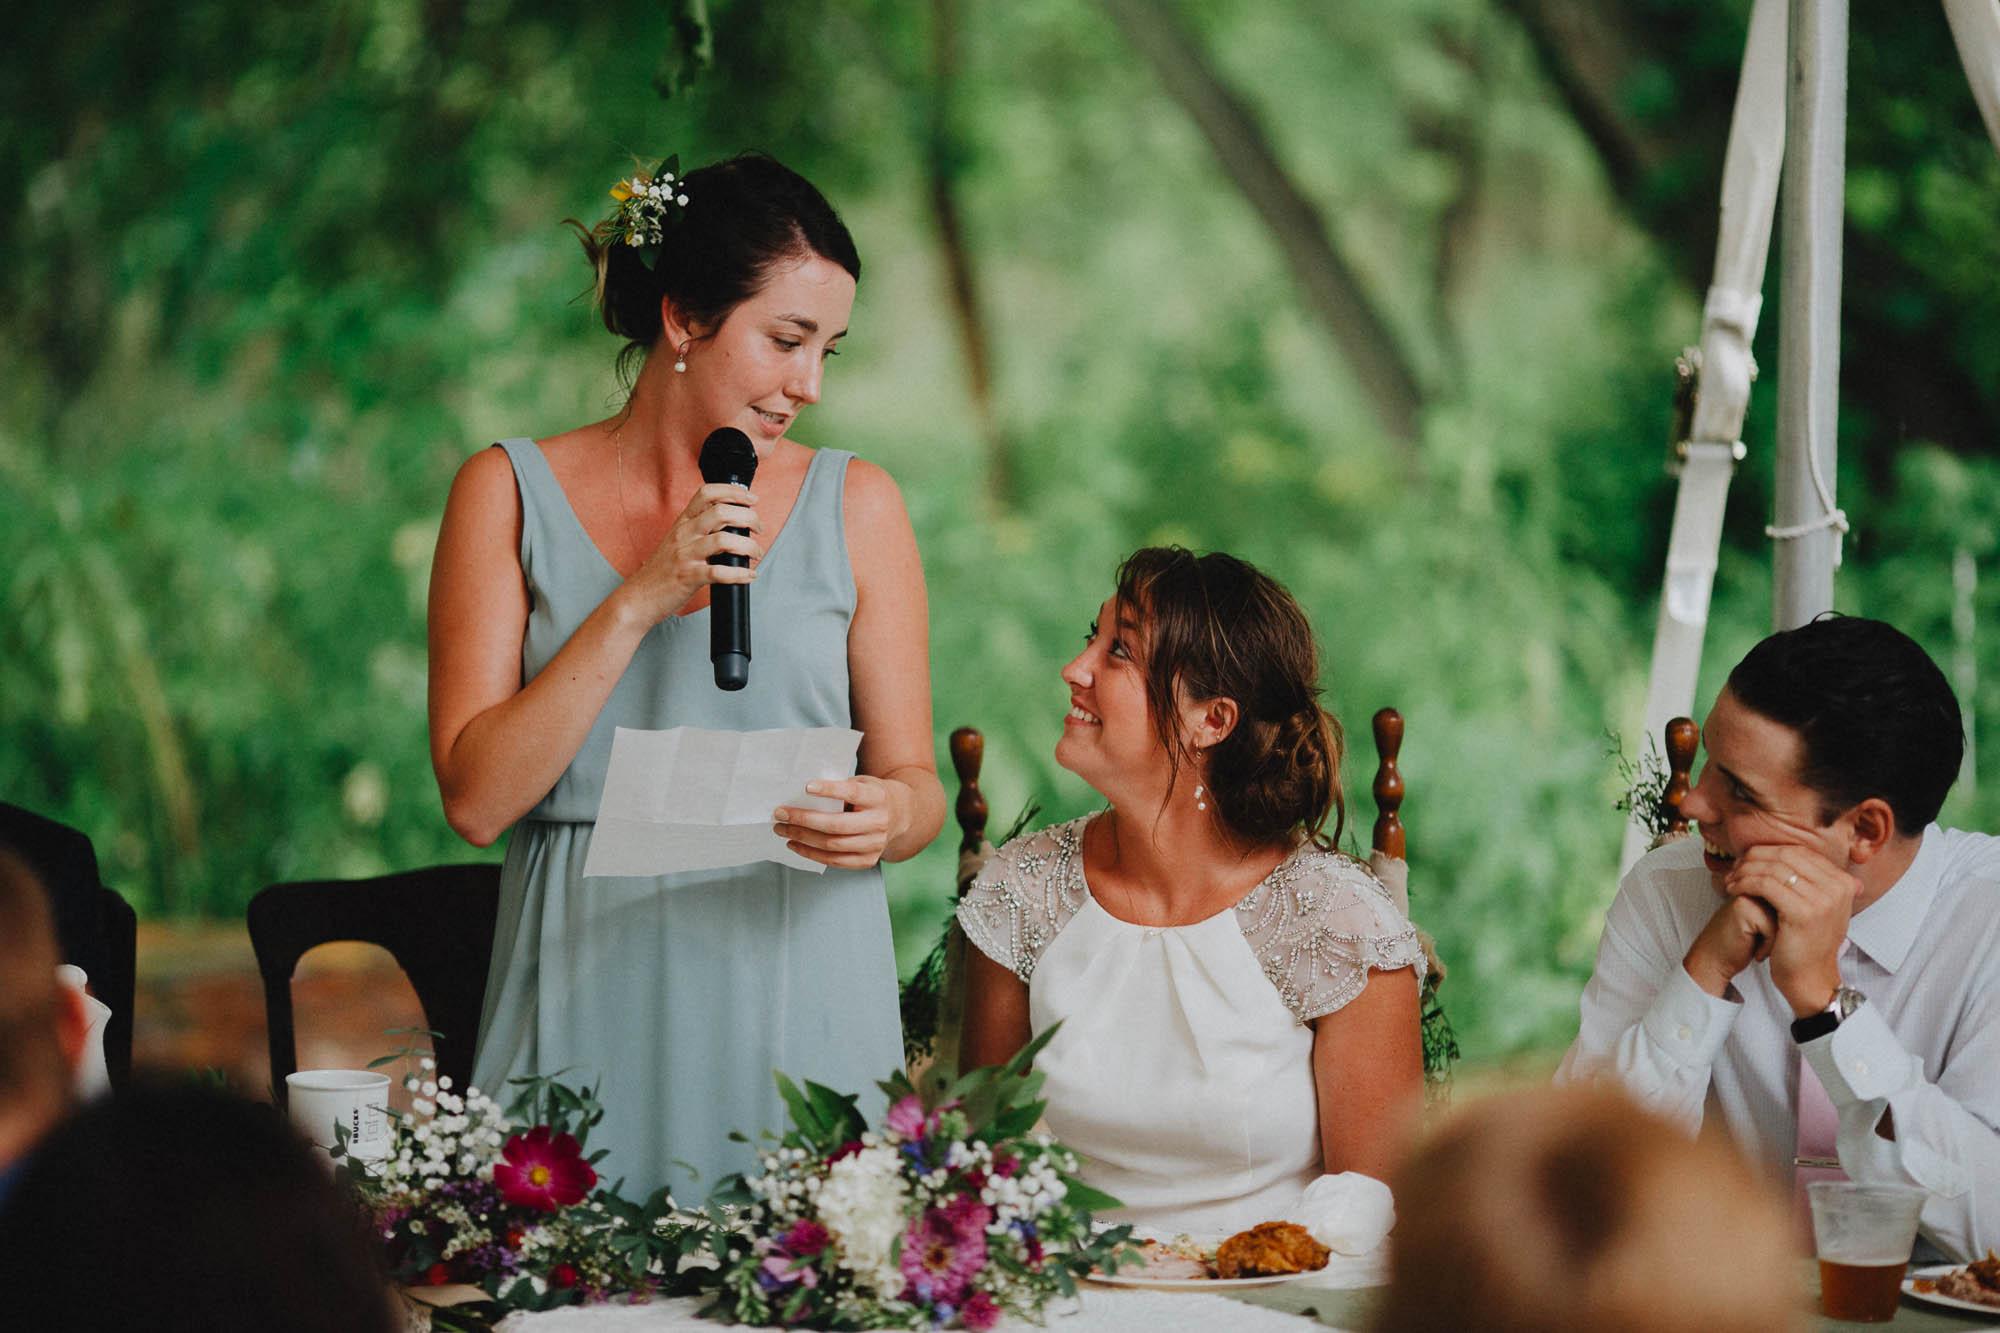 Leah-Graham-Michigan-Outdoor-DIY-Wedding-062@2x.jpg